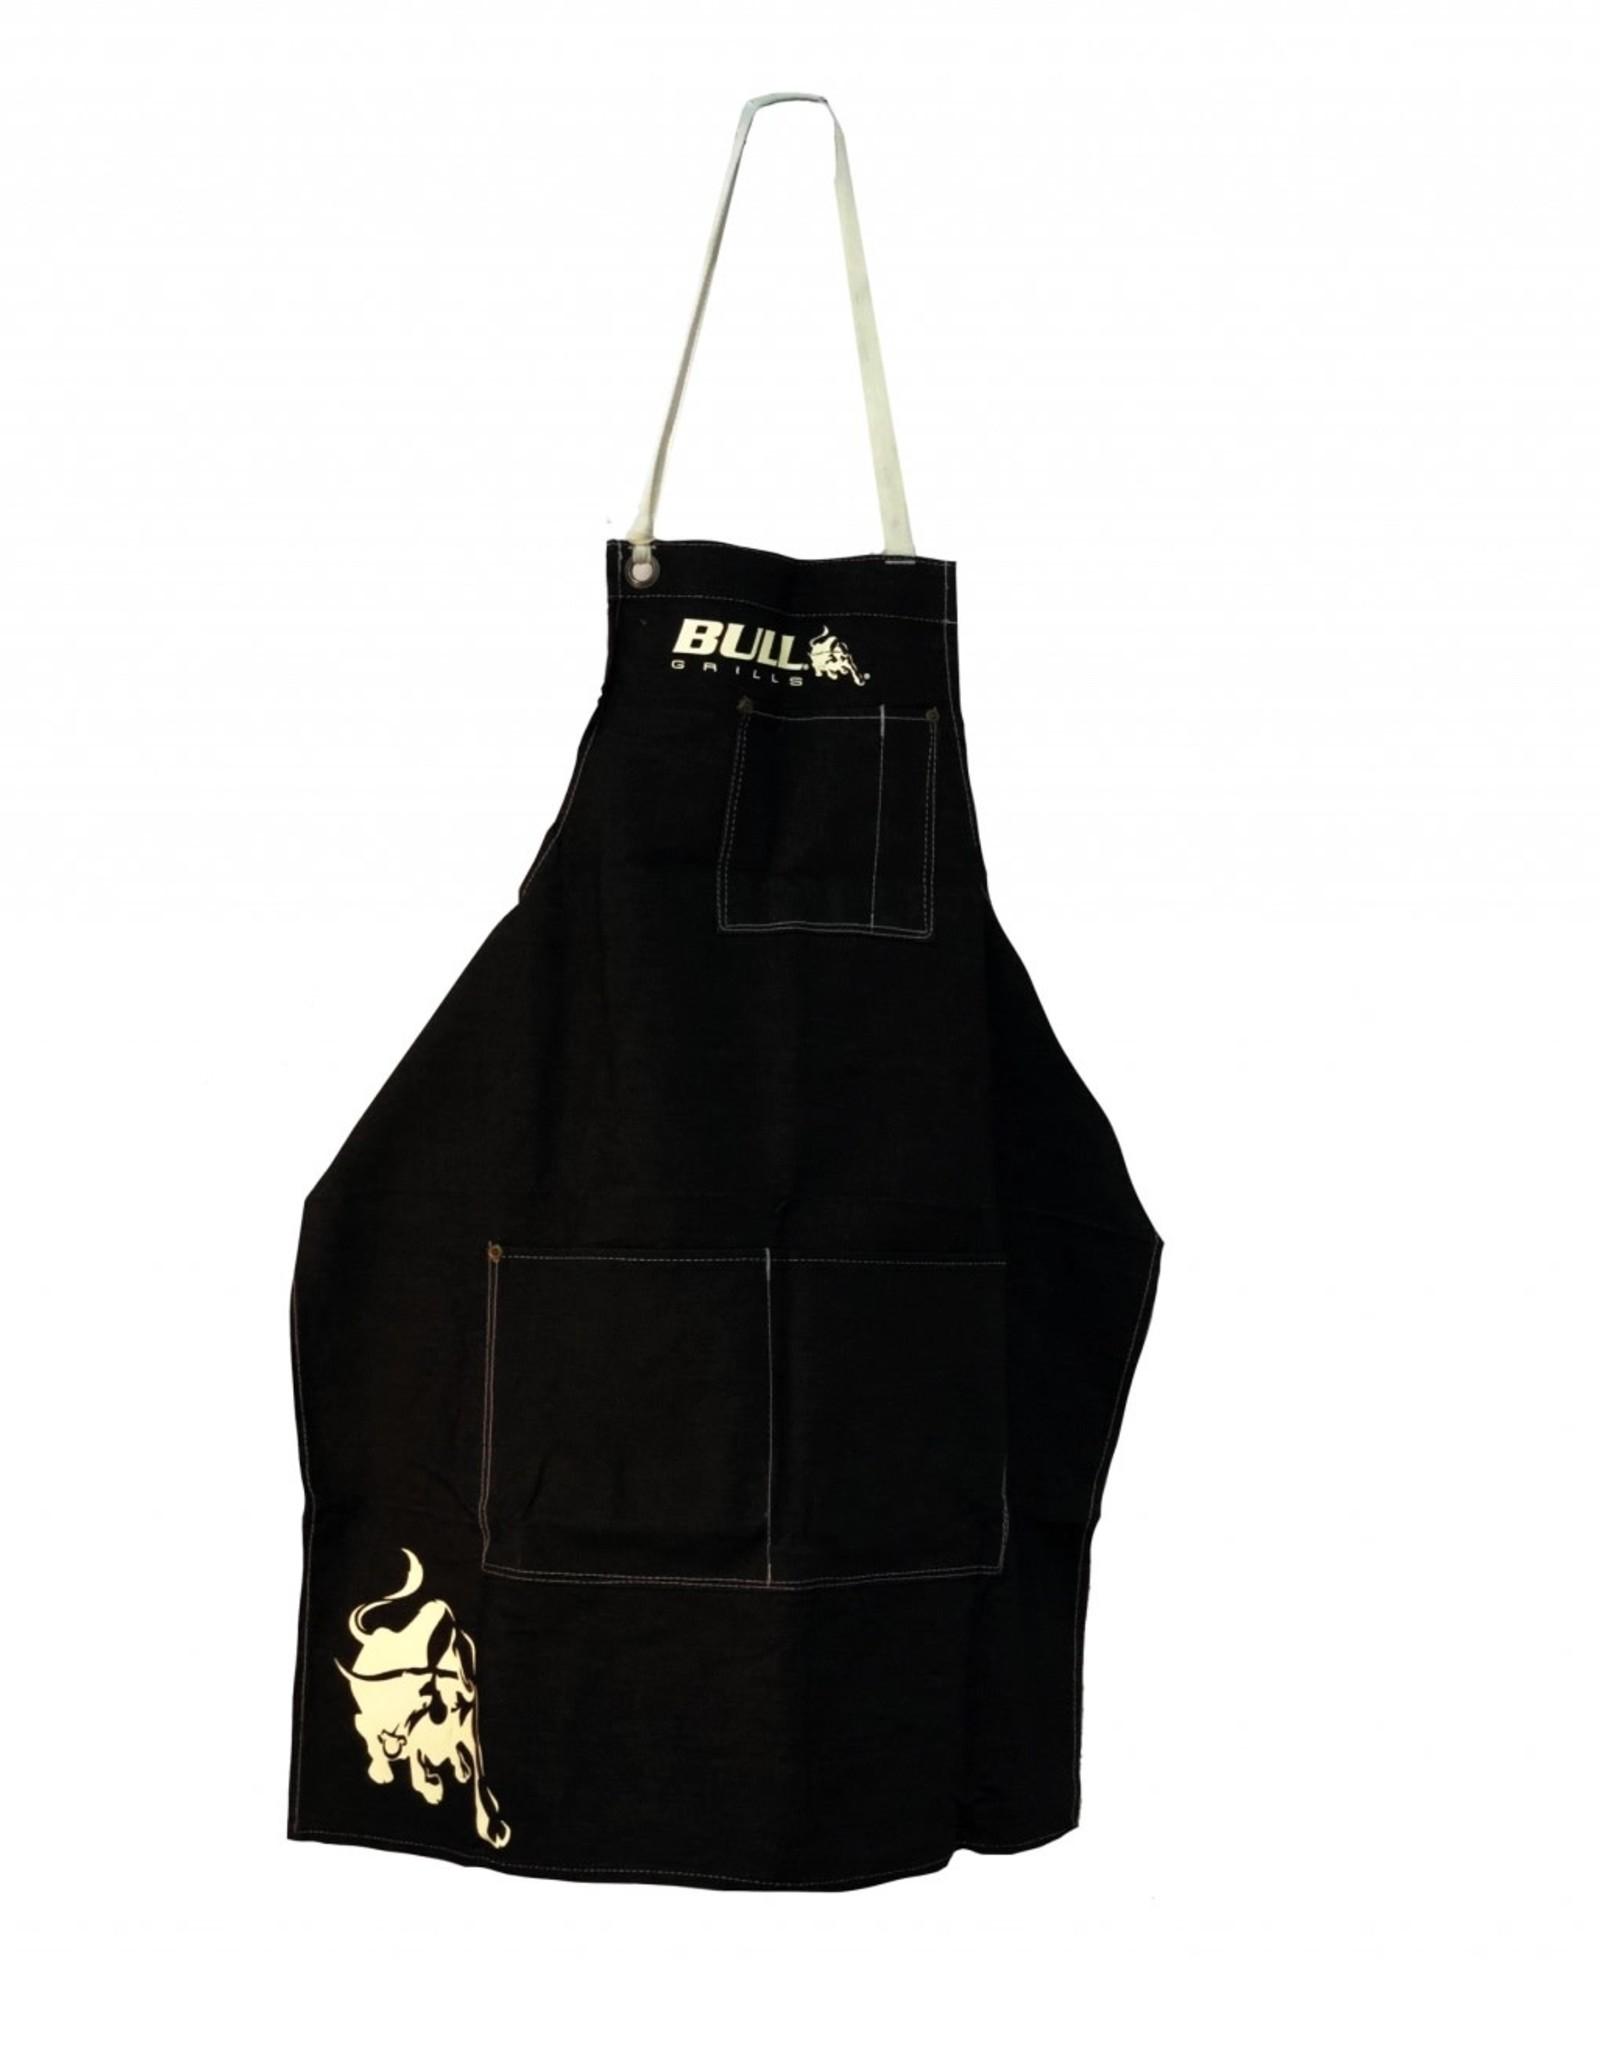 Bull Bull Denim Grill Master Apron - 24290